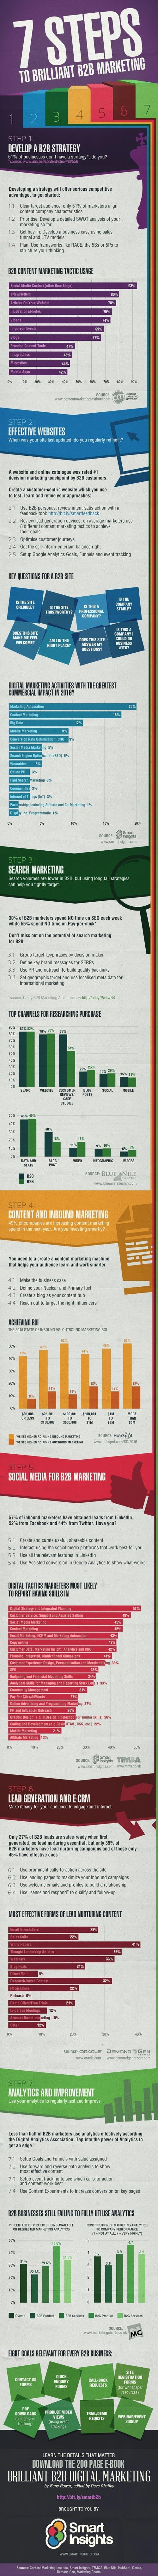 7-steps-to-brilliant-b2b-digital-marketing-infographic